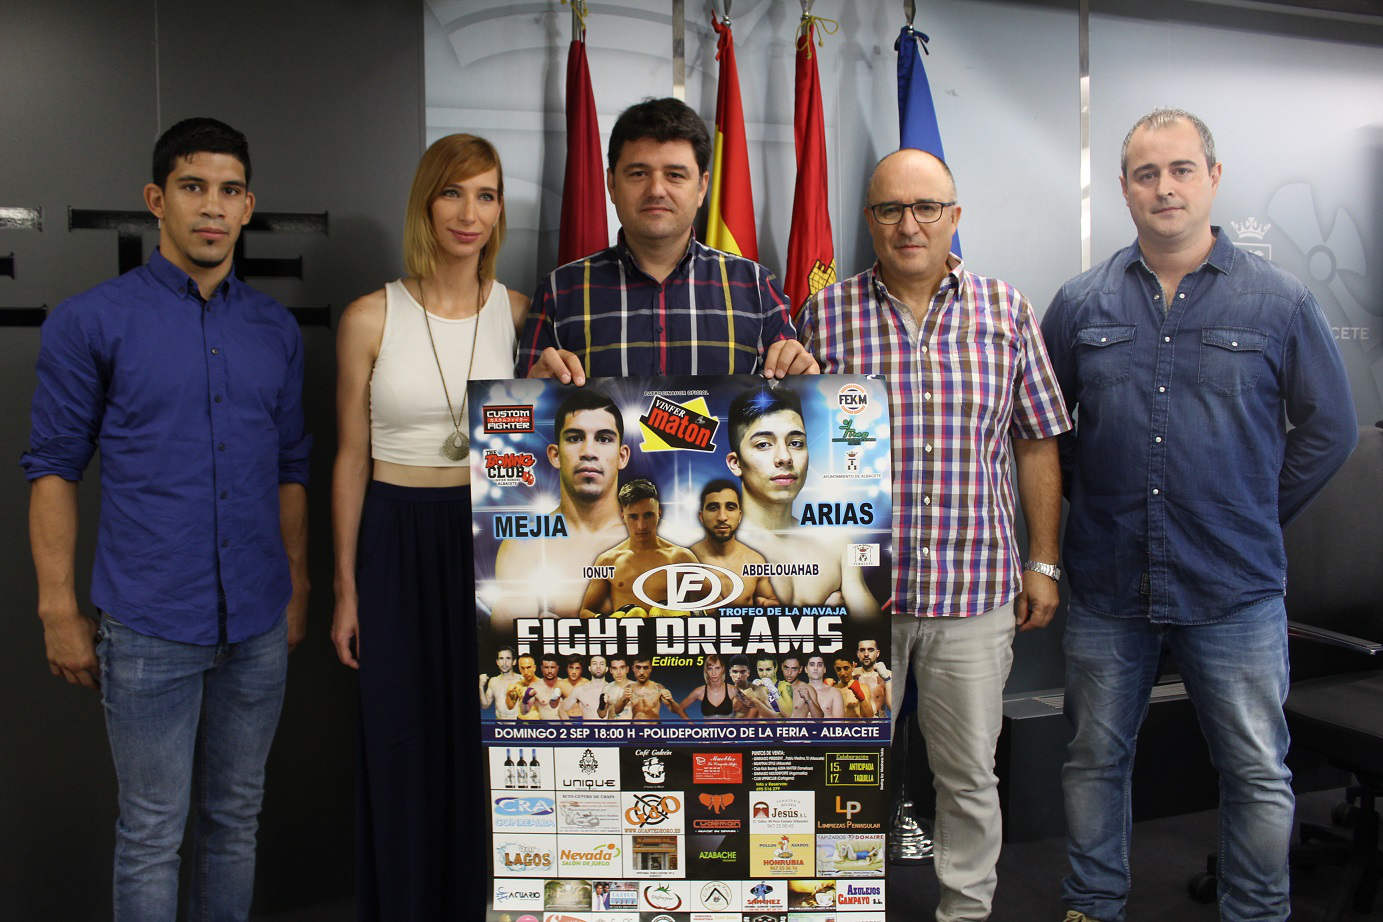 Trofeo Internacional de Kick Boxing La Navaja